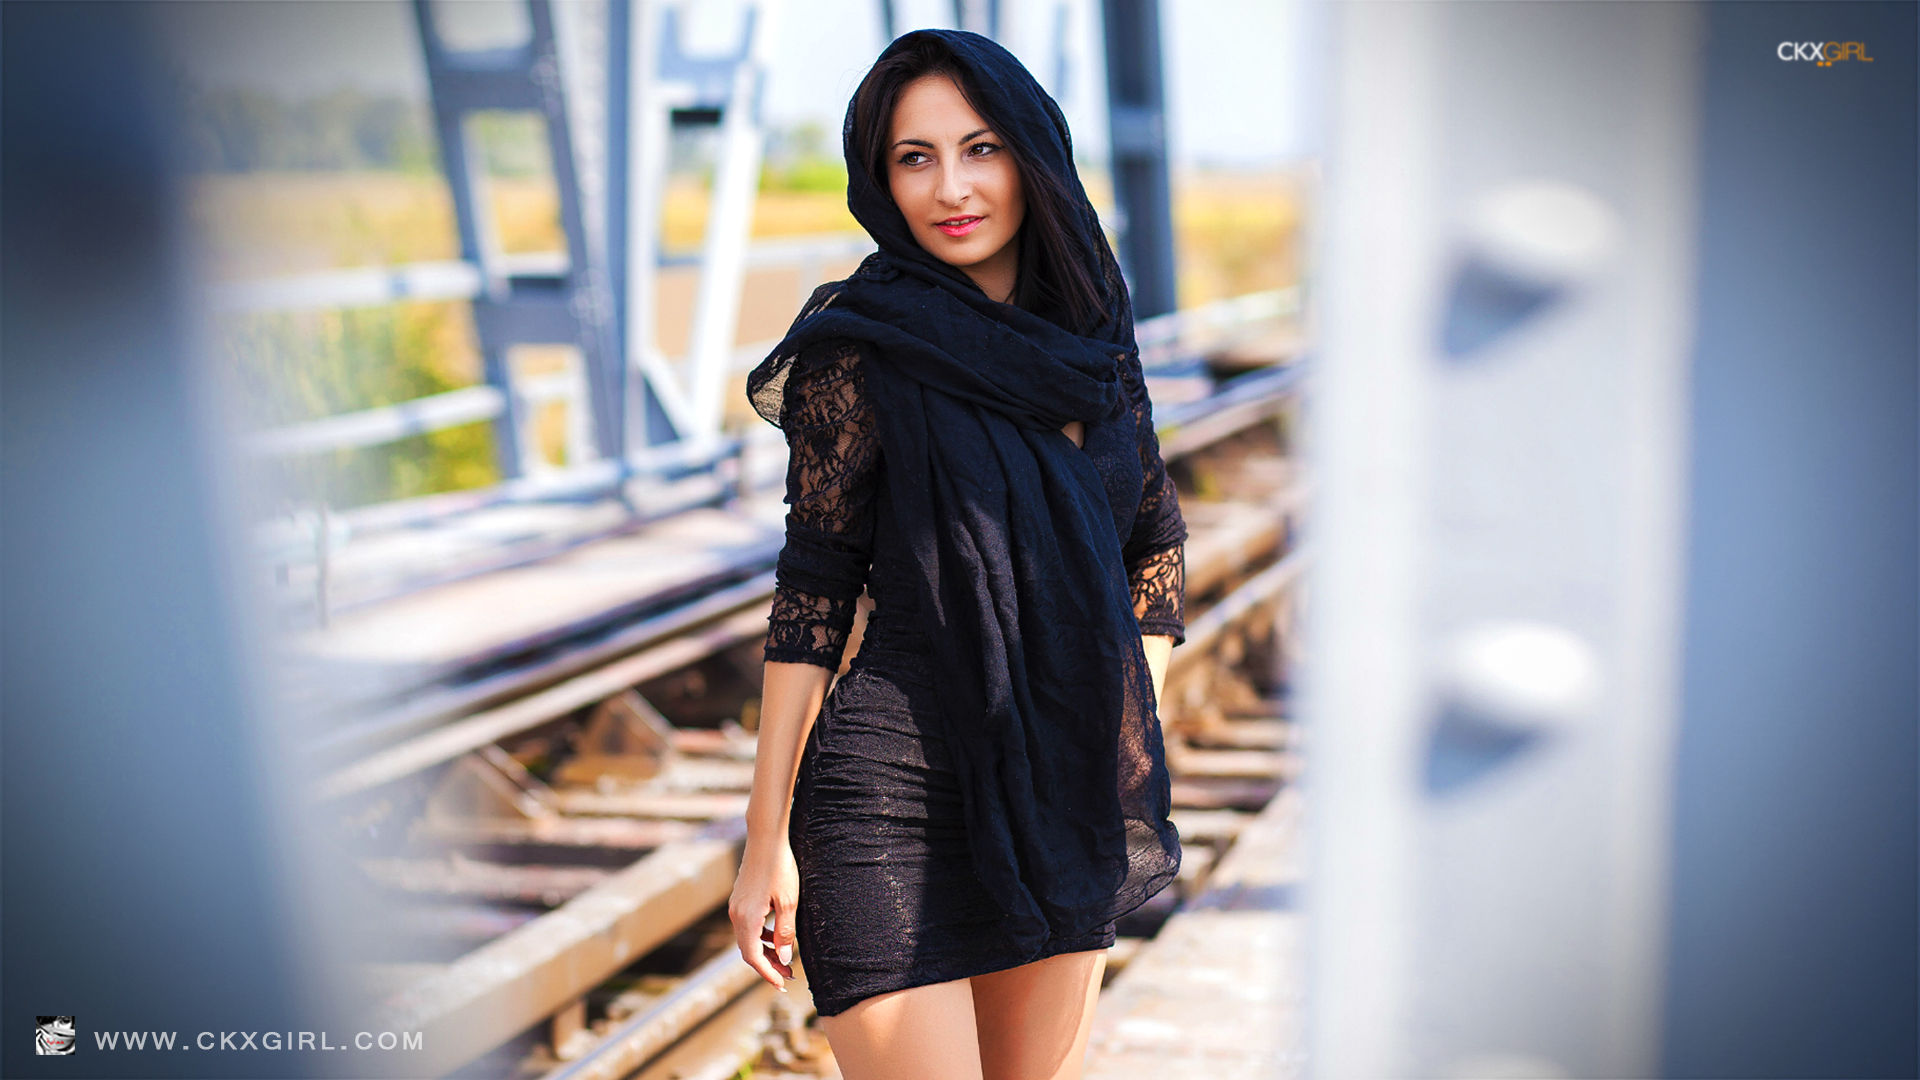 Muslimaishaa  Cokegirlx  Muslim Hijab Girls  Live Sex -6527